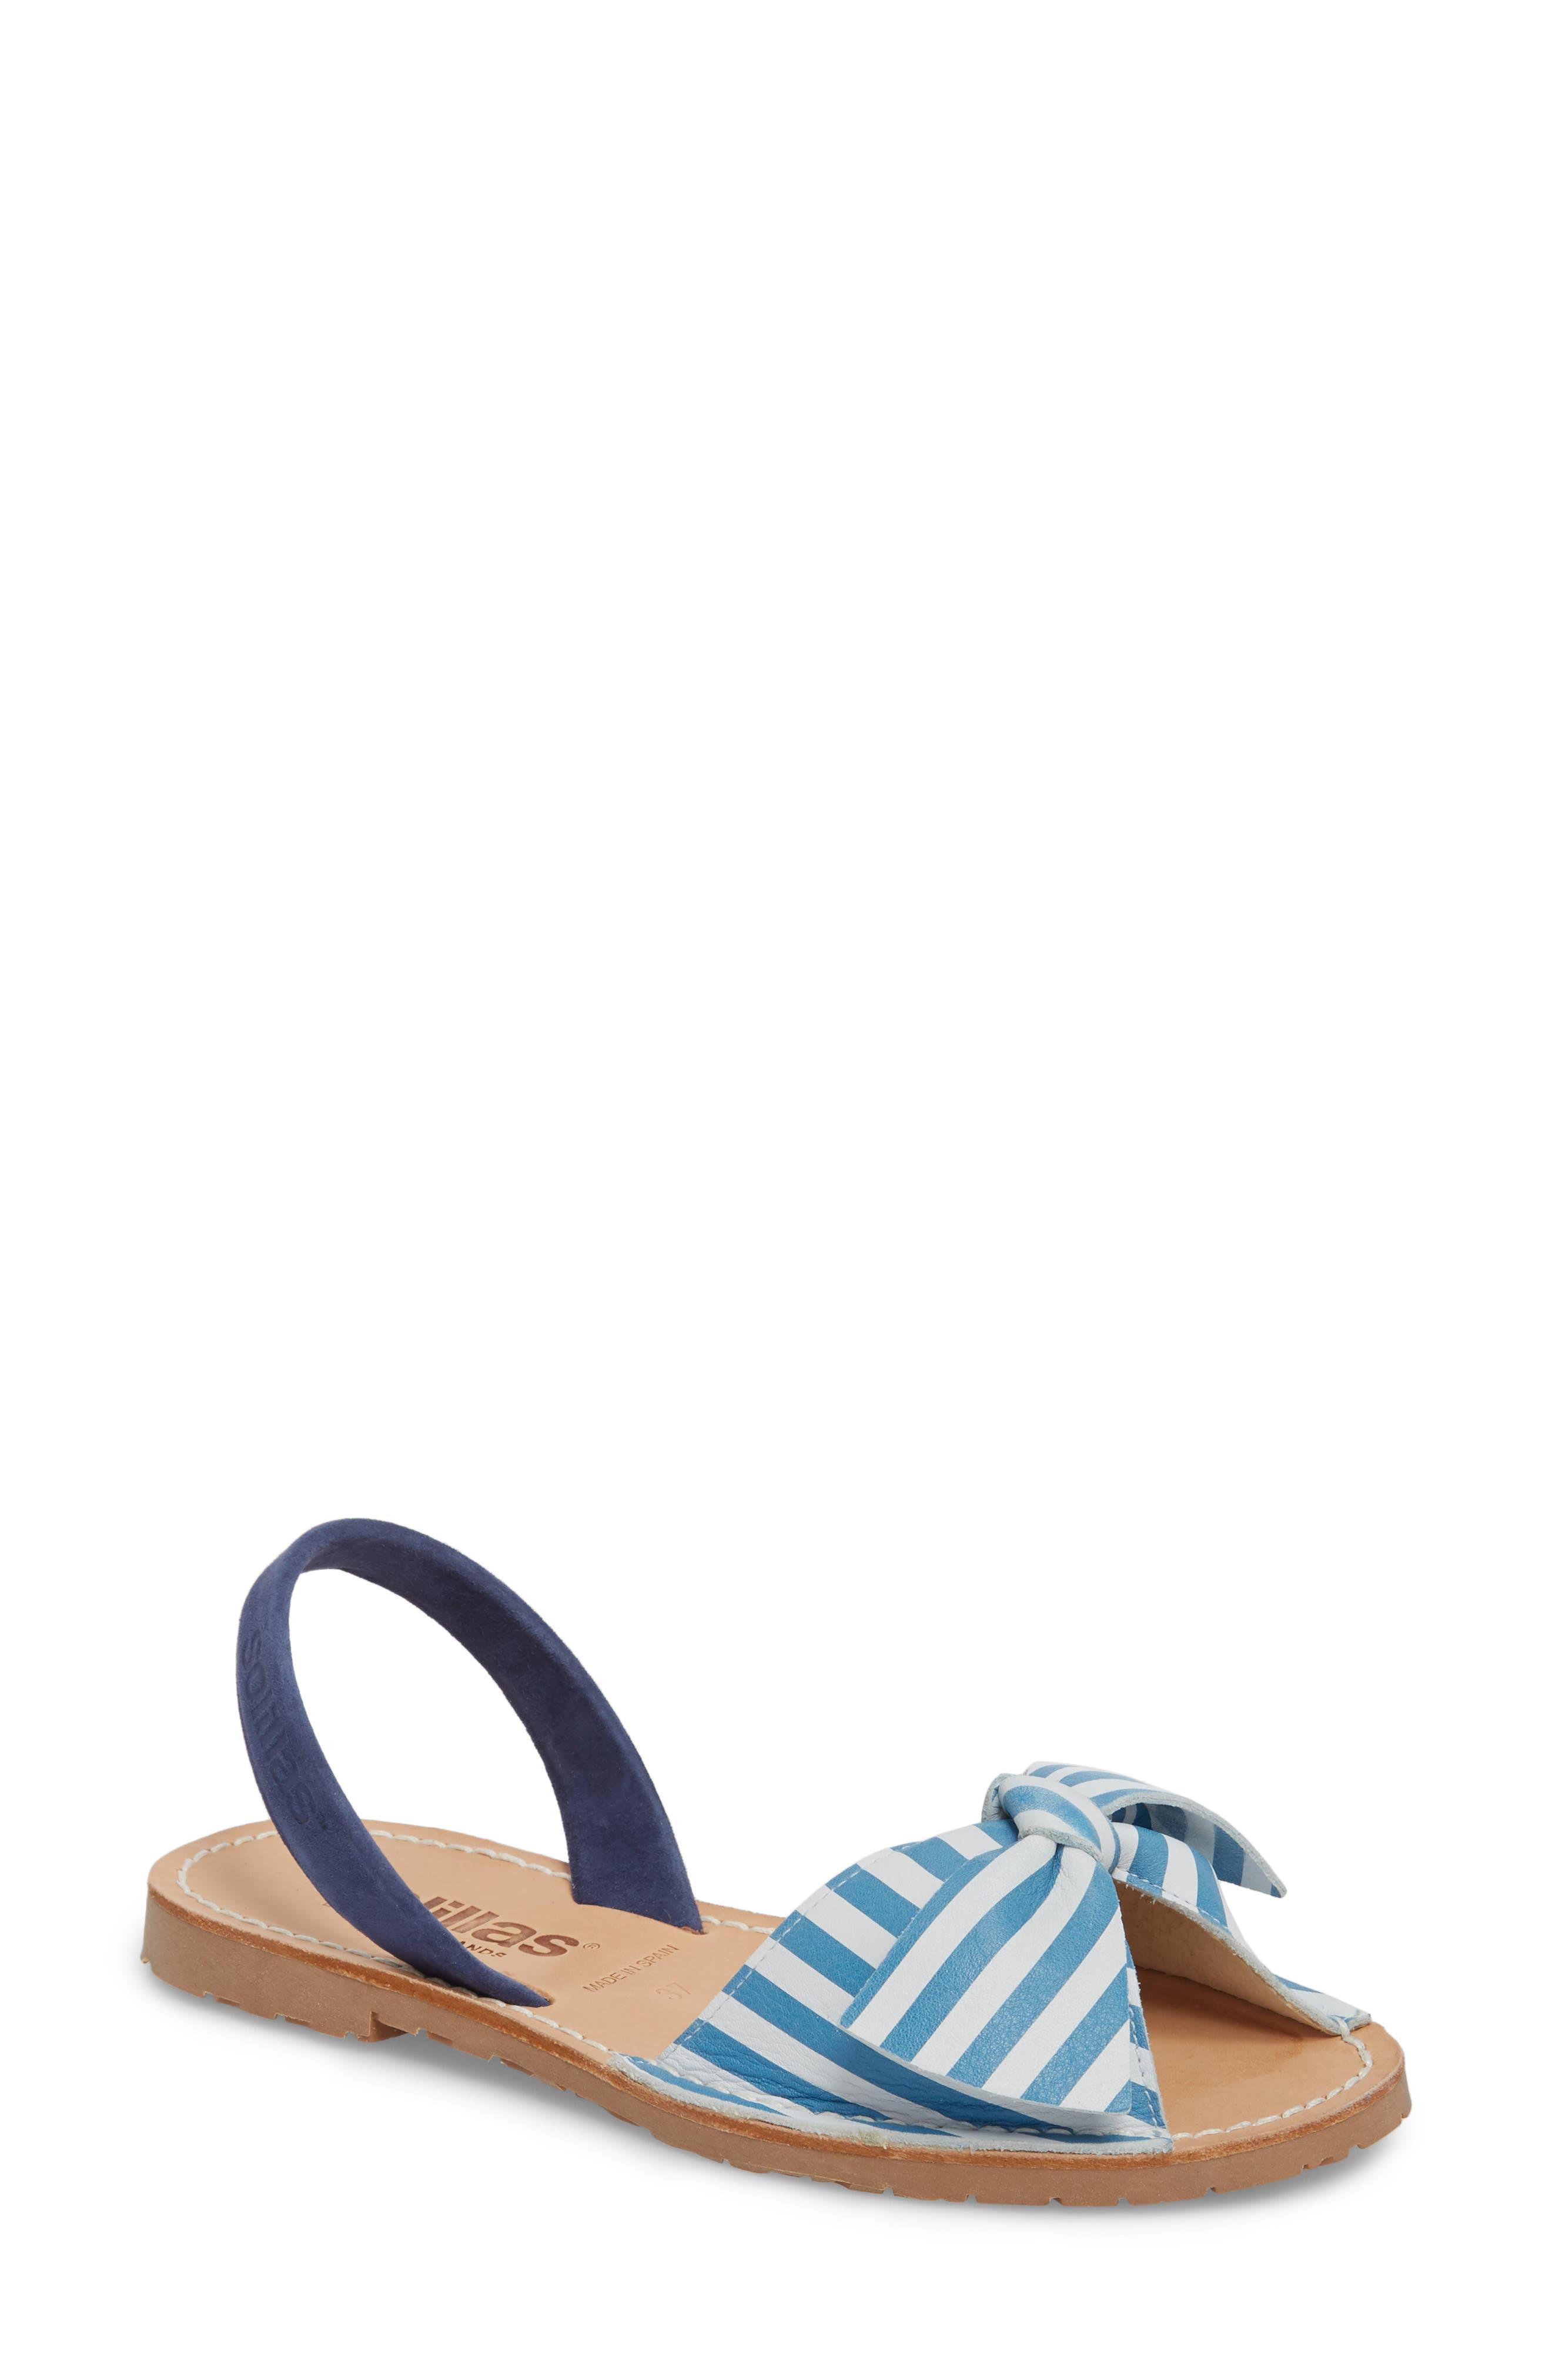 Bow Sandal,                             Main thumbnail 1, color,                             Blue And White